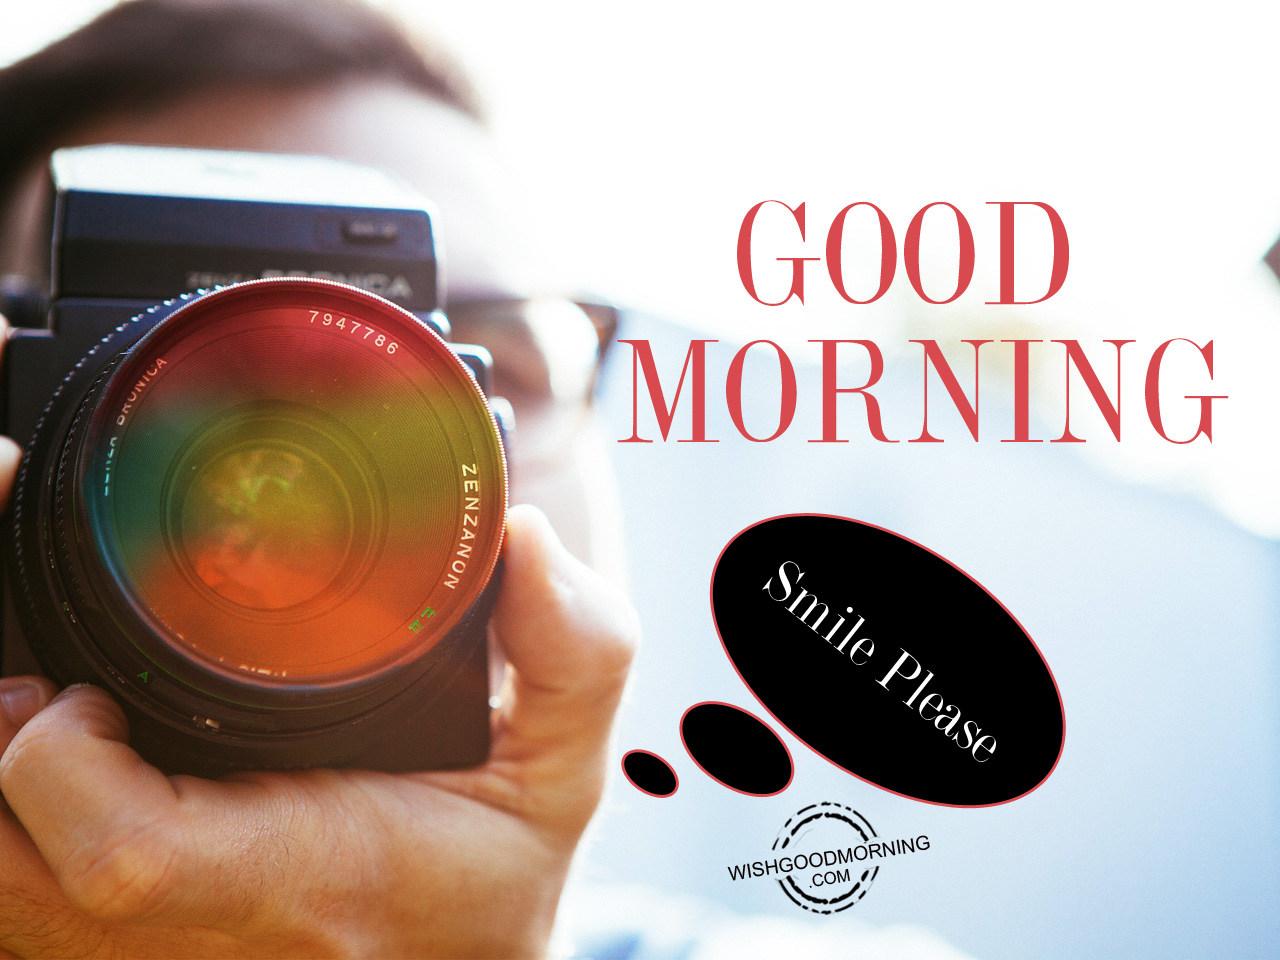 Good Morning Smile Pics : Good morning smile hd images best wallpaper